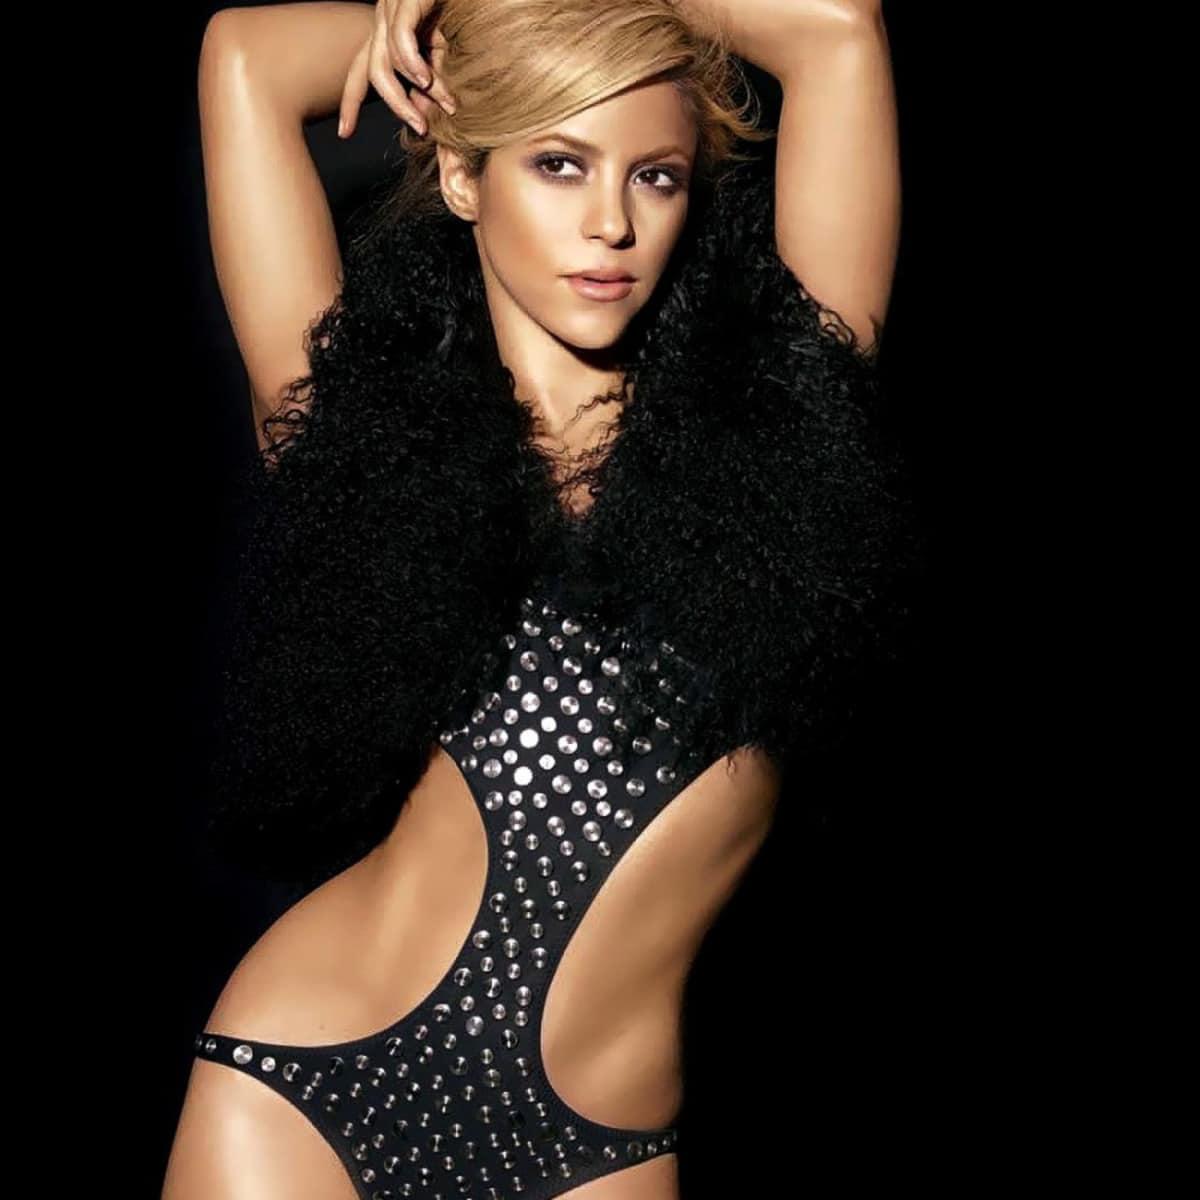 News_Michael D. Clark_concert pick_Shakira